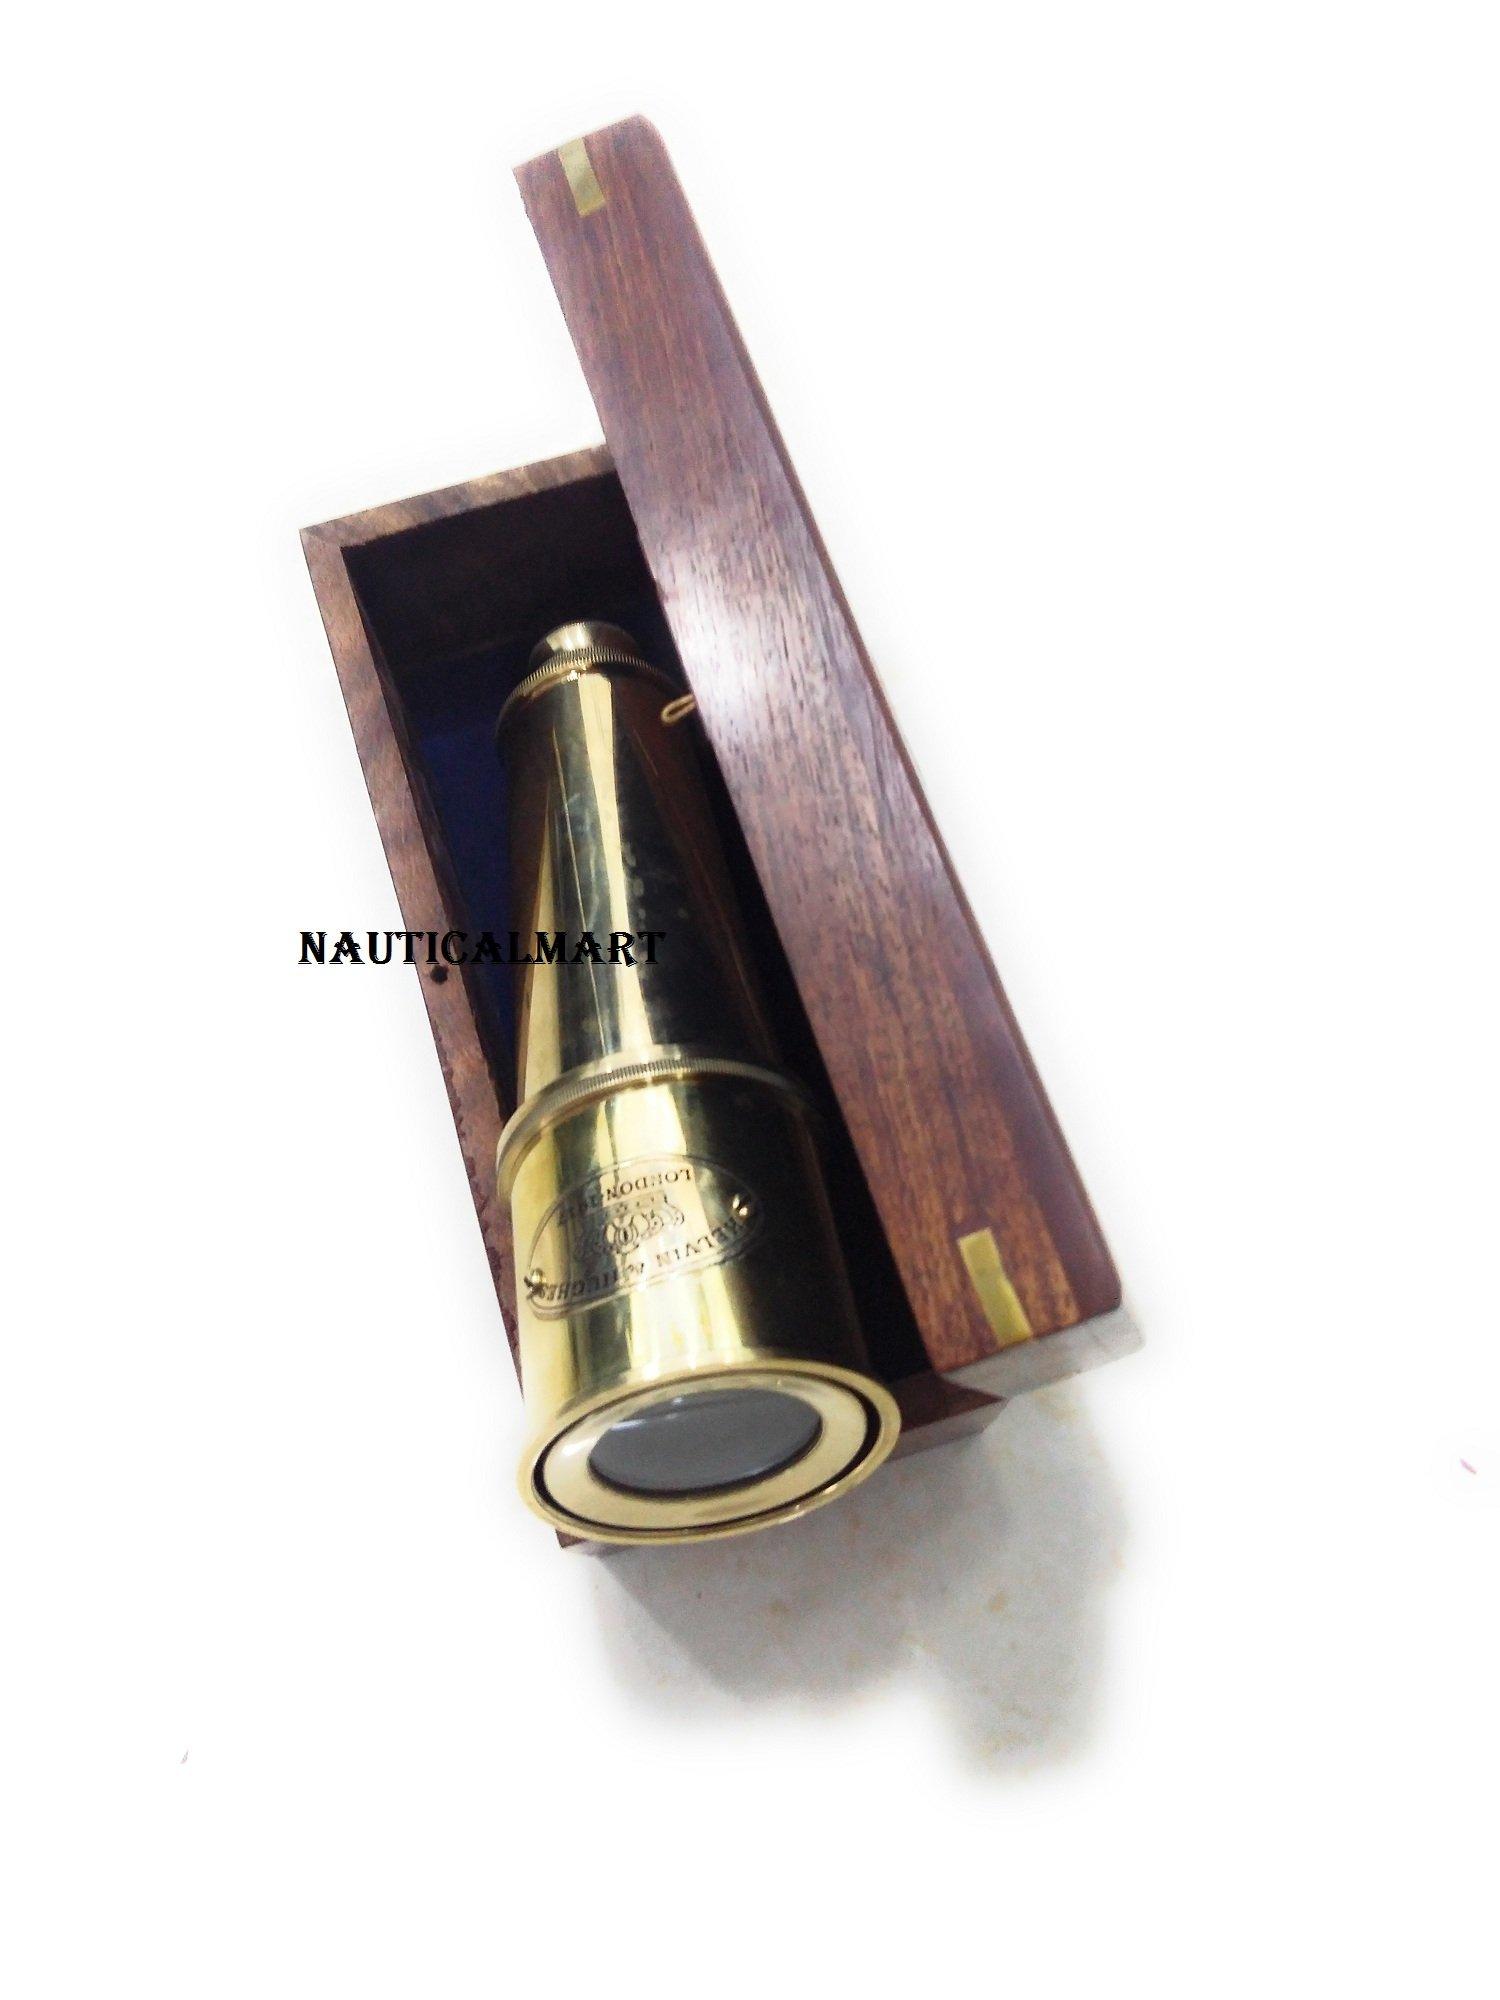 18'' Solid Brass' KELVIN & HUGHES LONDON - 1917' Telescope W/ Wooden Box By Nauticalmart by NAUTICALMART (Image #2)